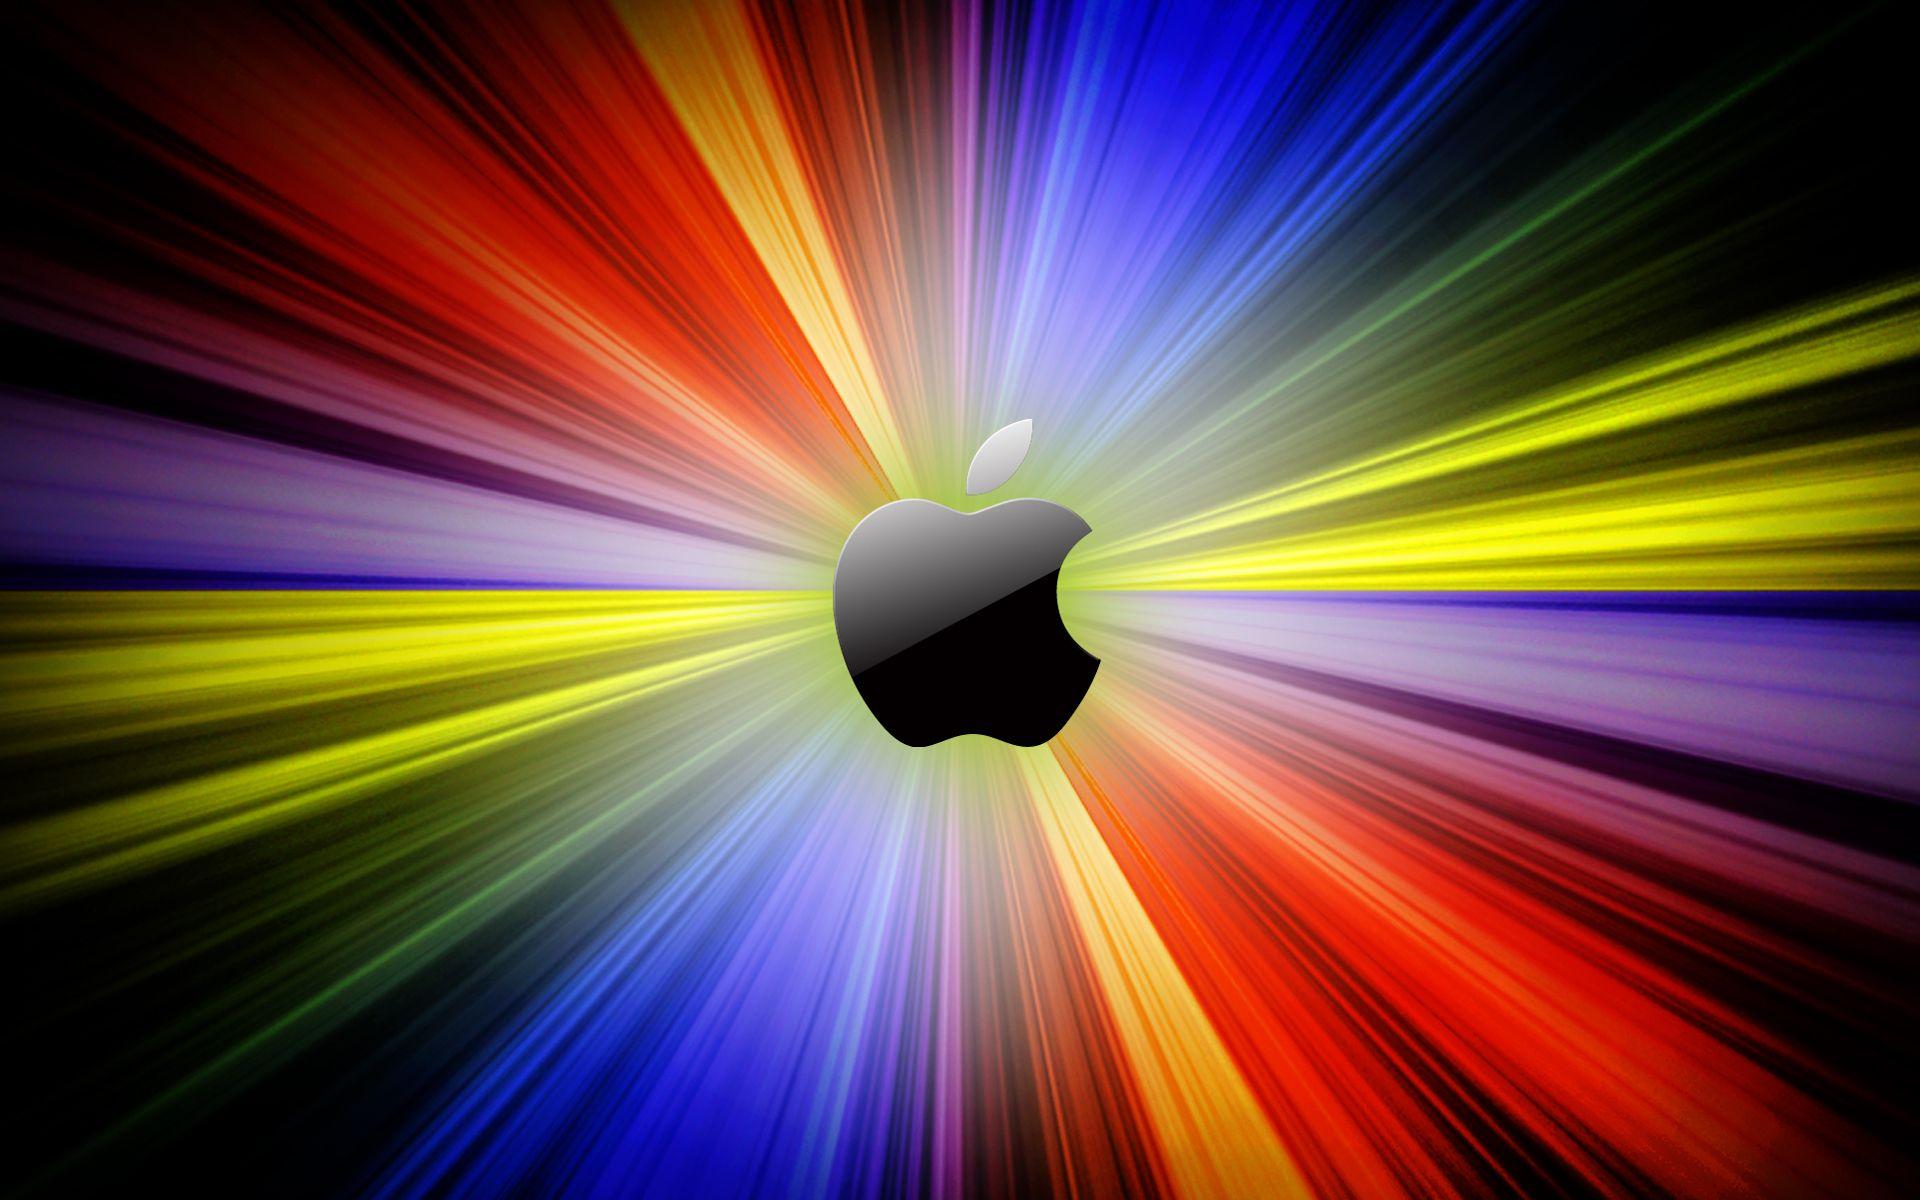 Explosion Of Colors Mac Wallpaper Download Free Mac Wallpapers